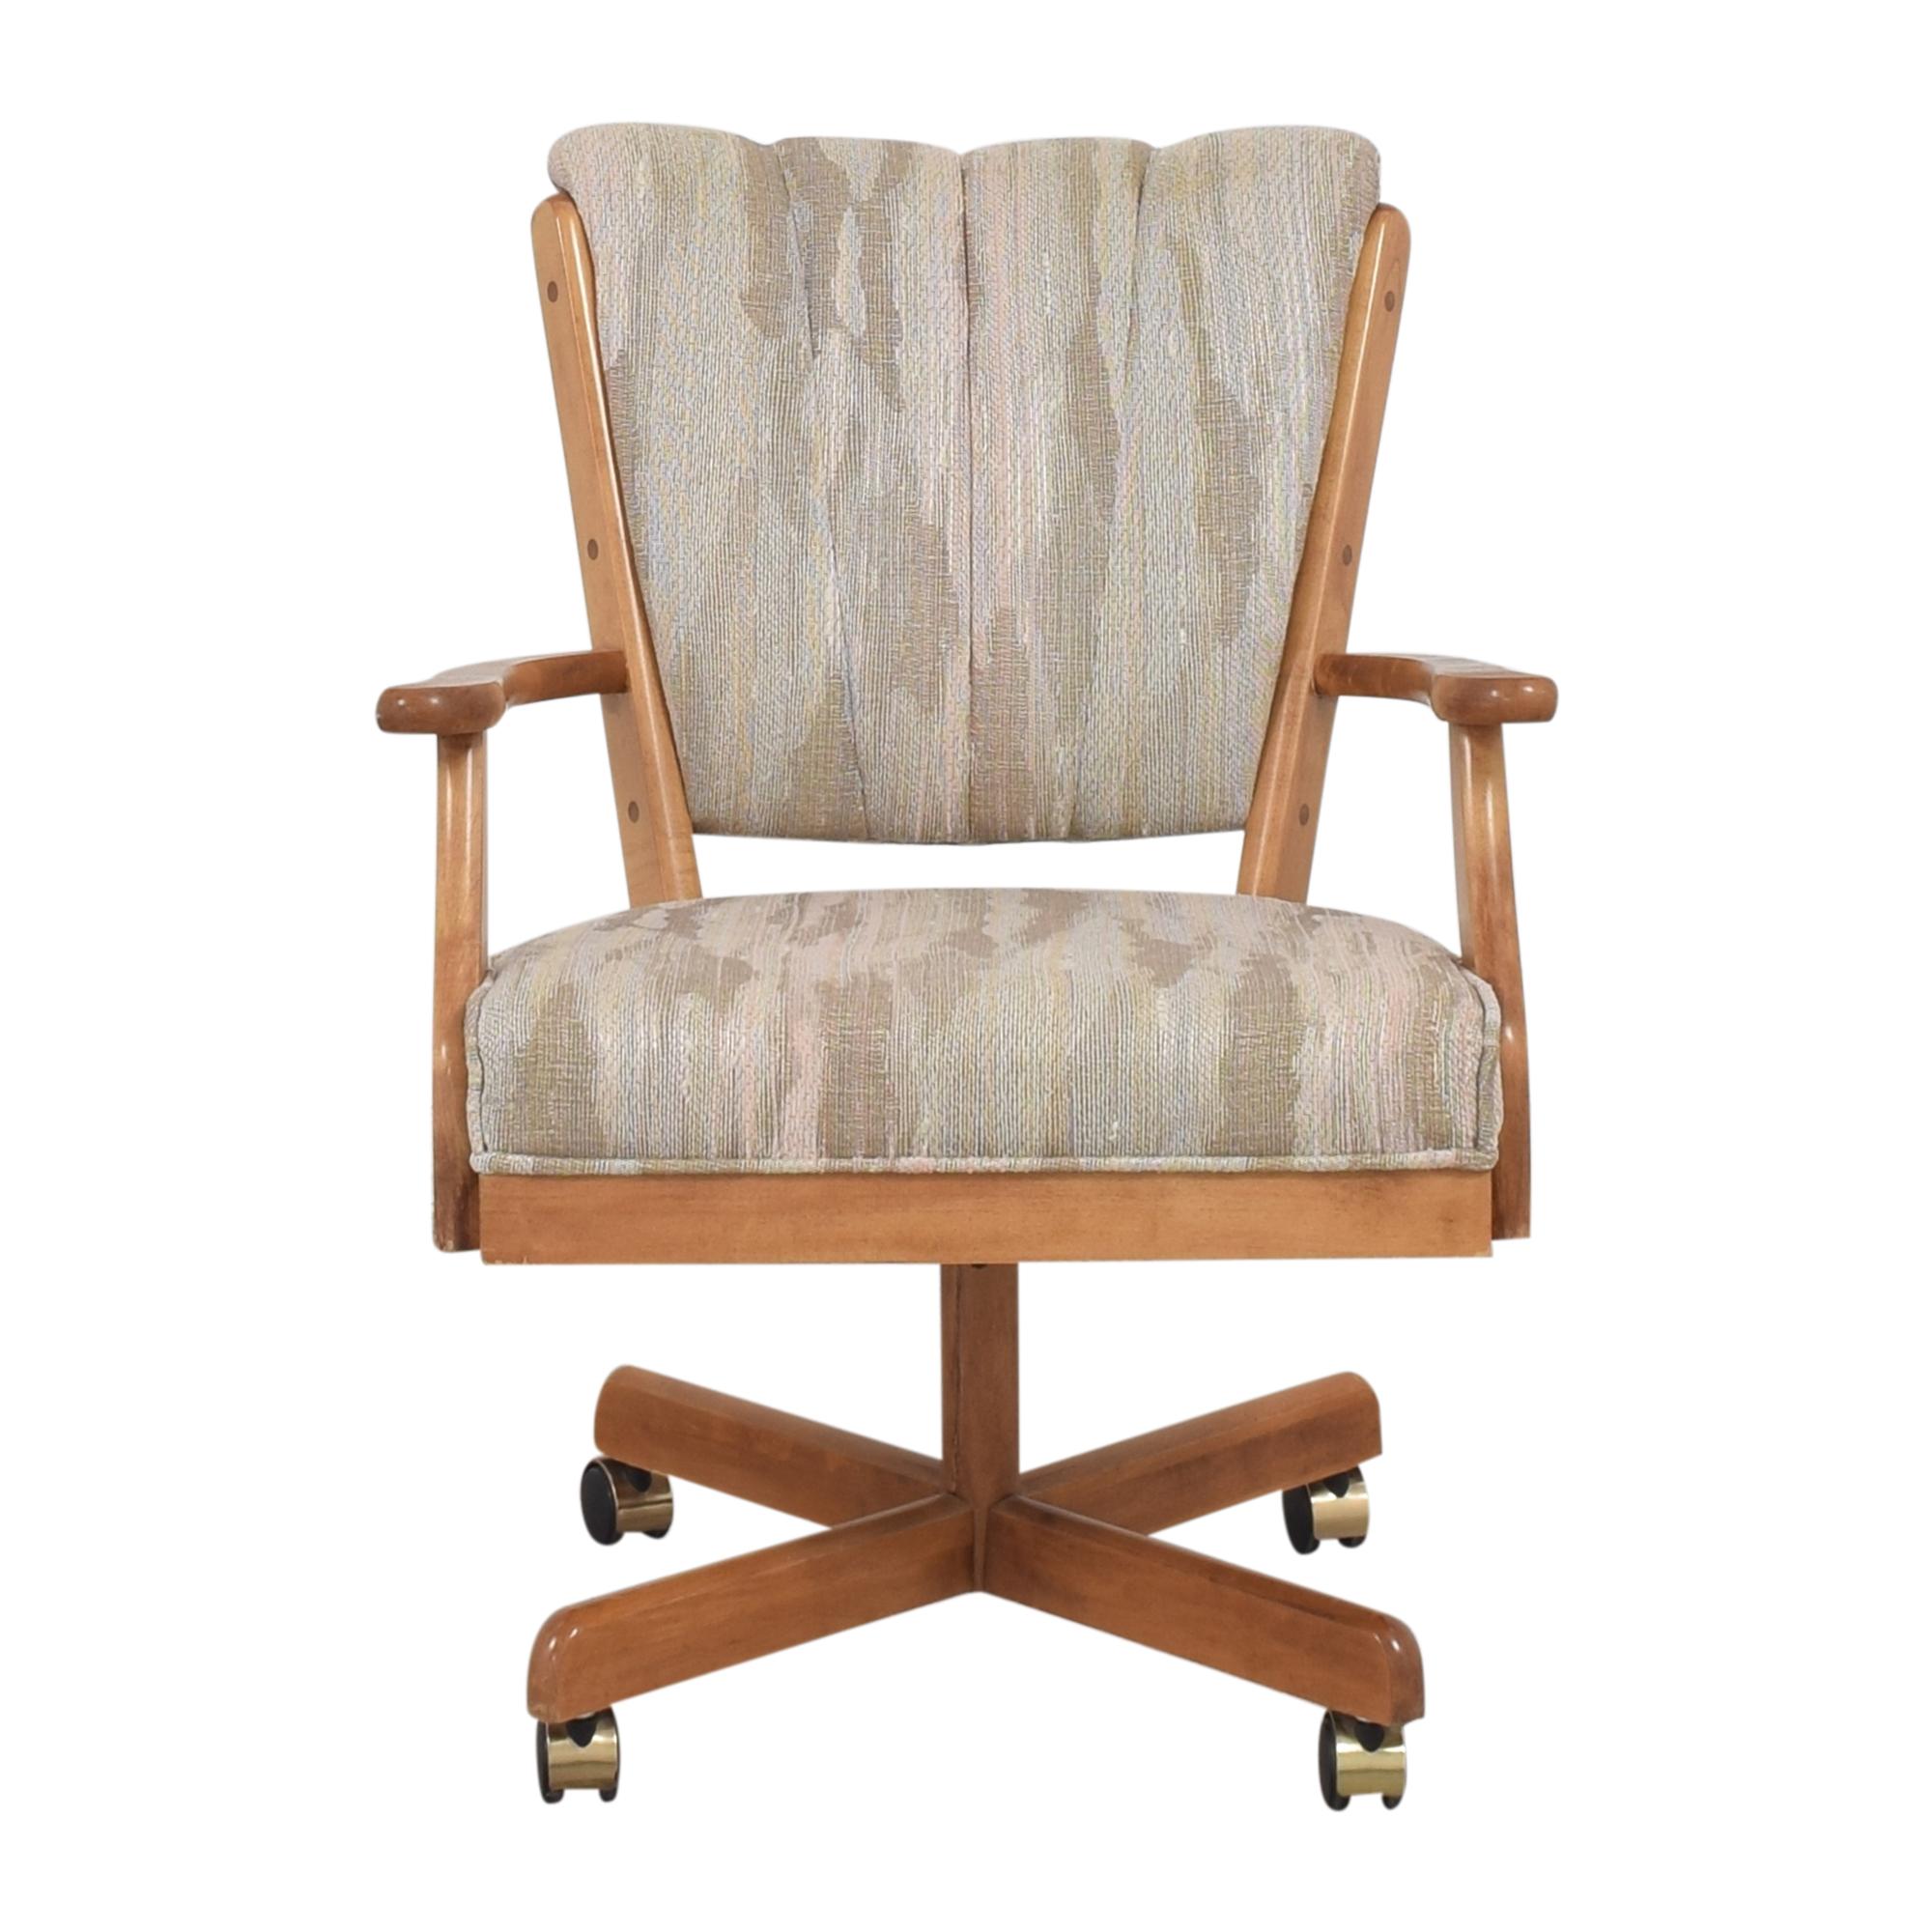 JBW Lustig JBW Lustig Office Chair for sale